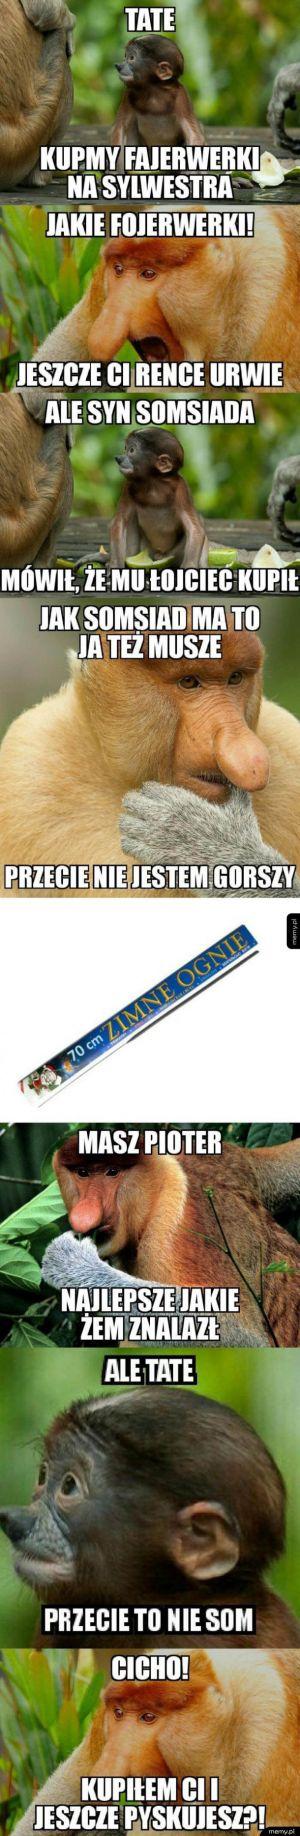 Janusz i fajerwerki